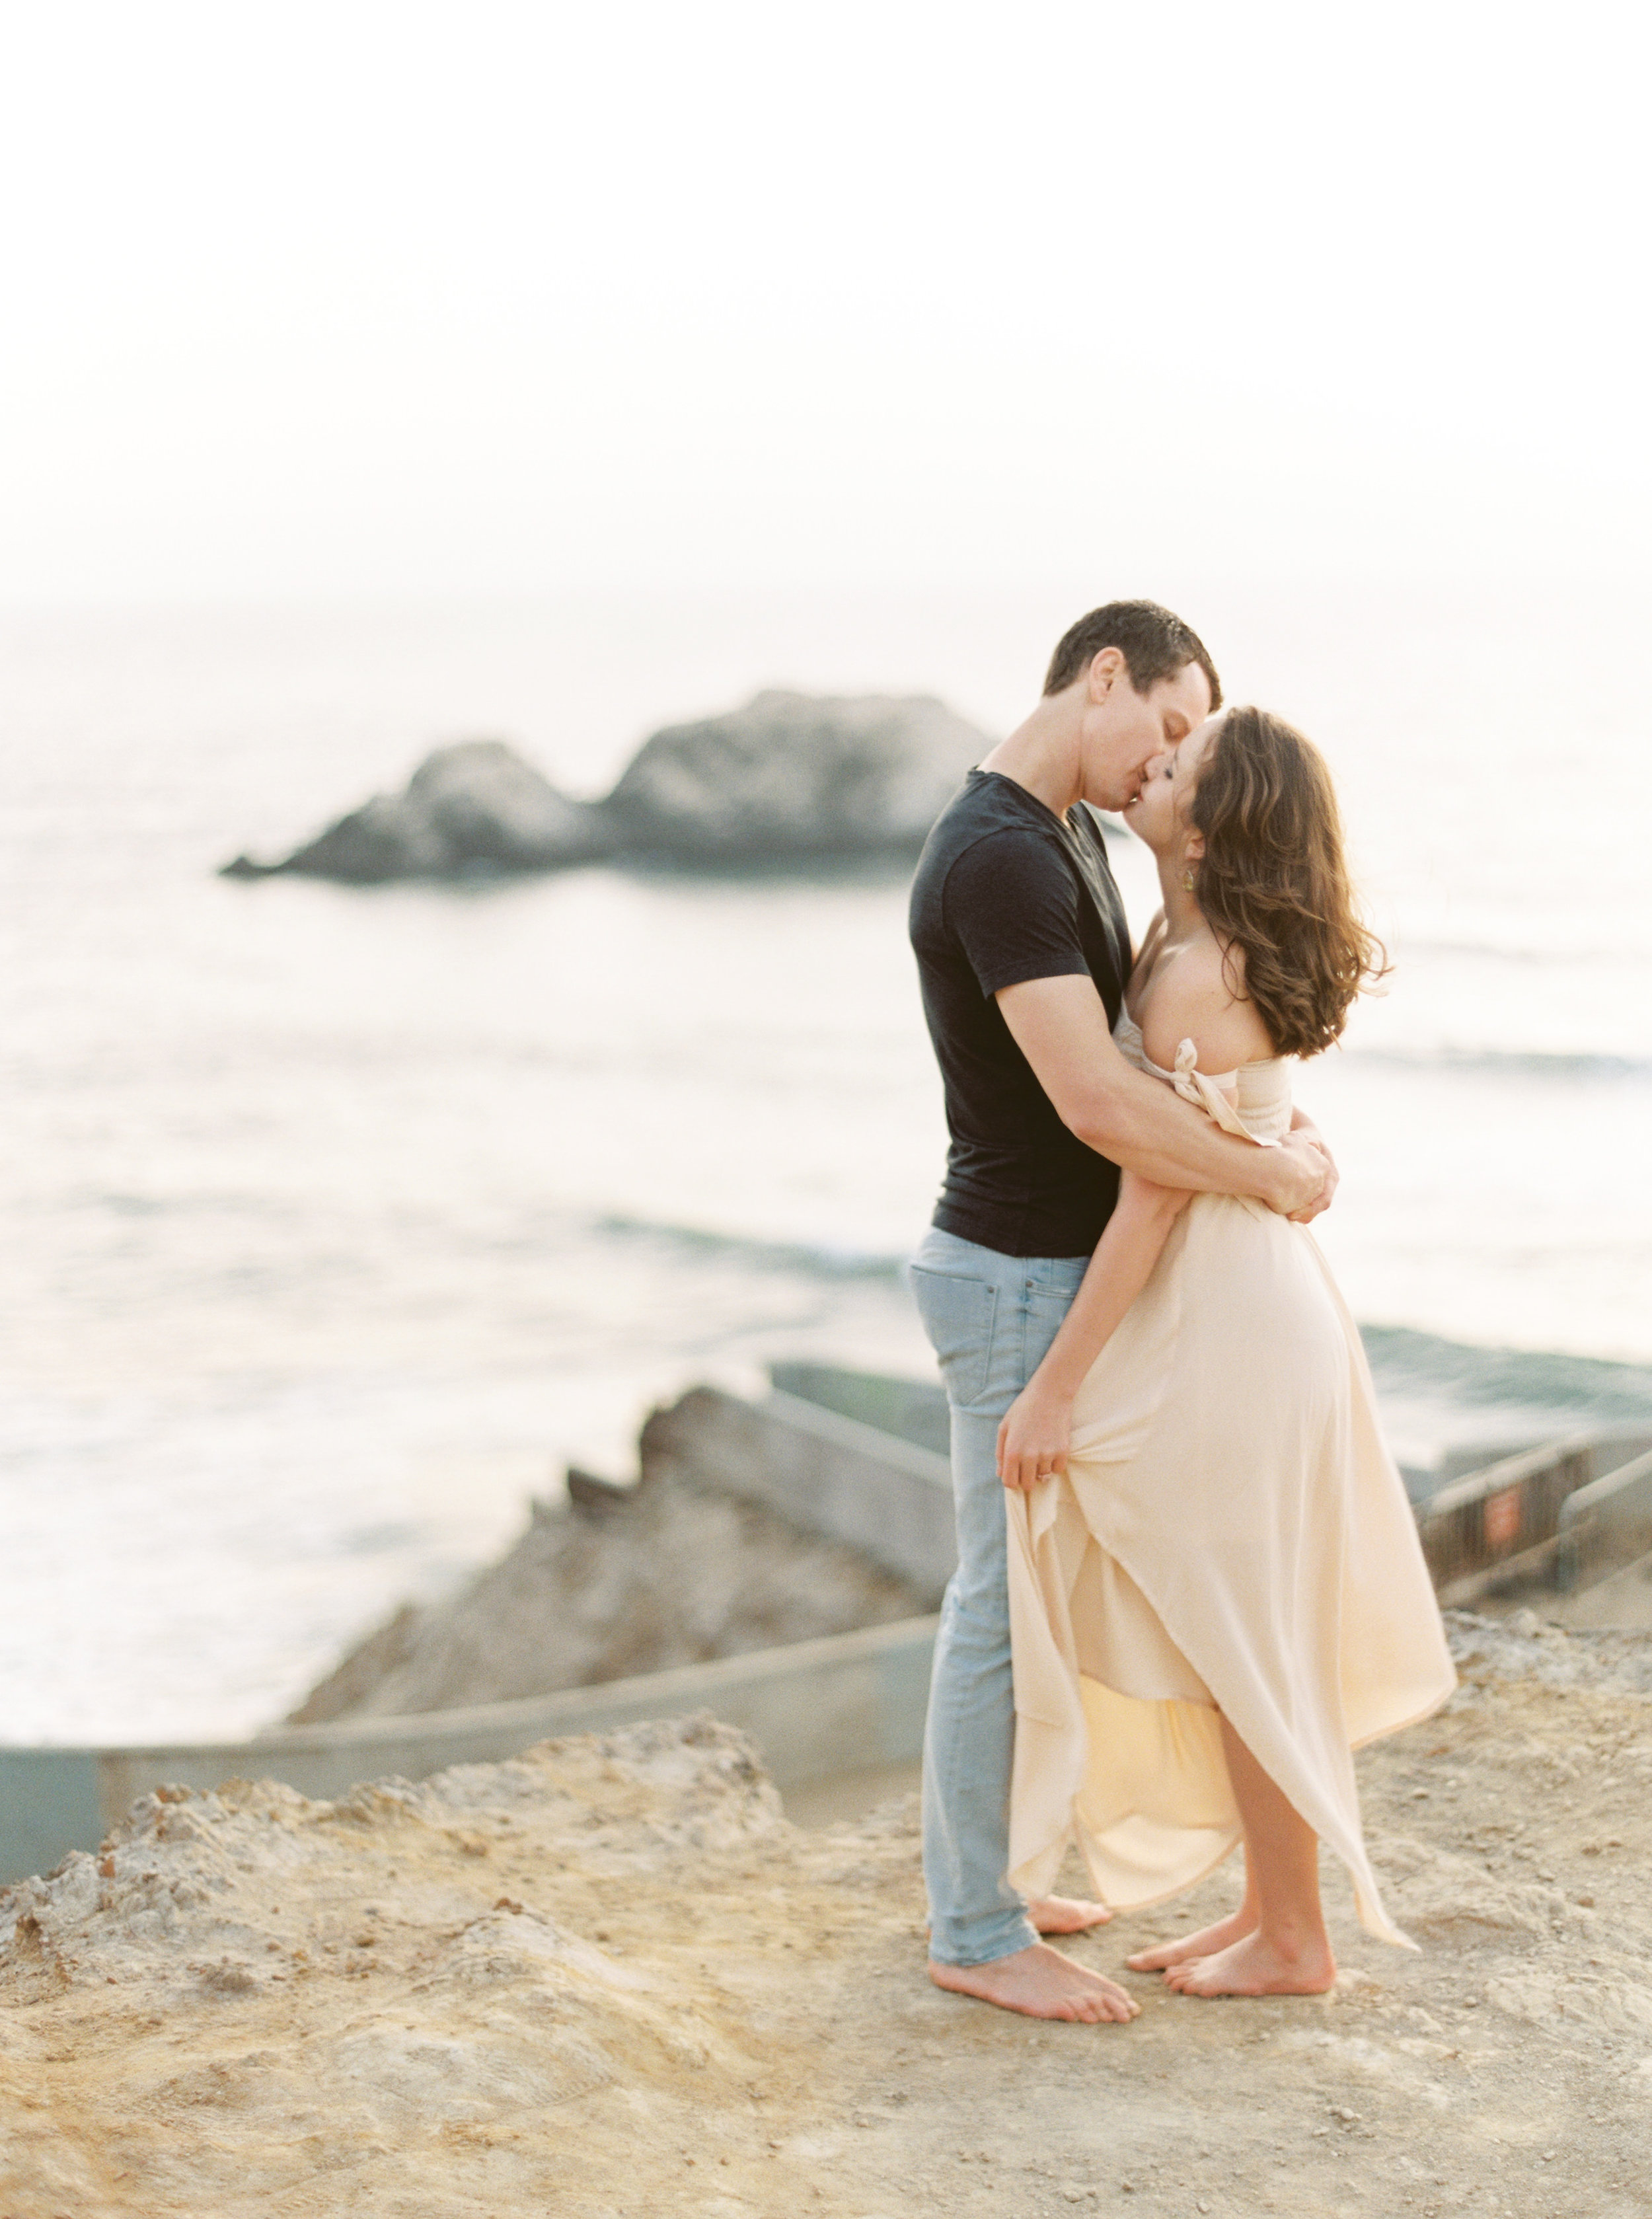 sutro-baths-san-francisco-california-engagement-26.jpg